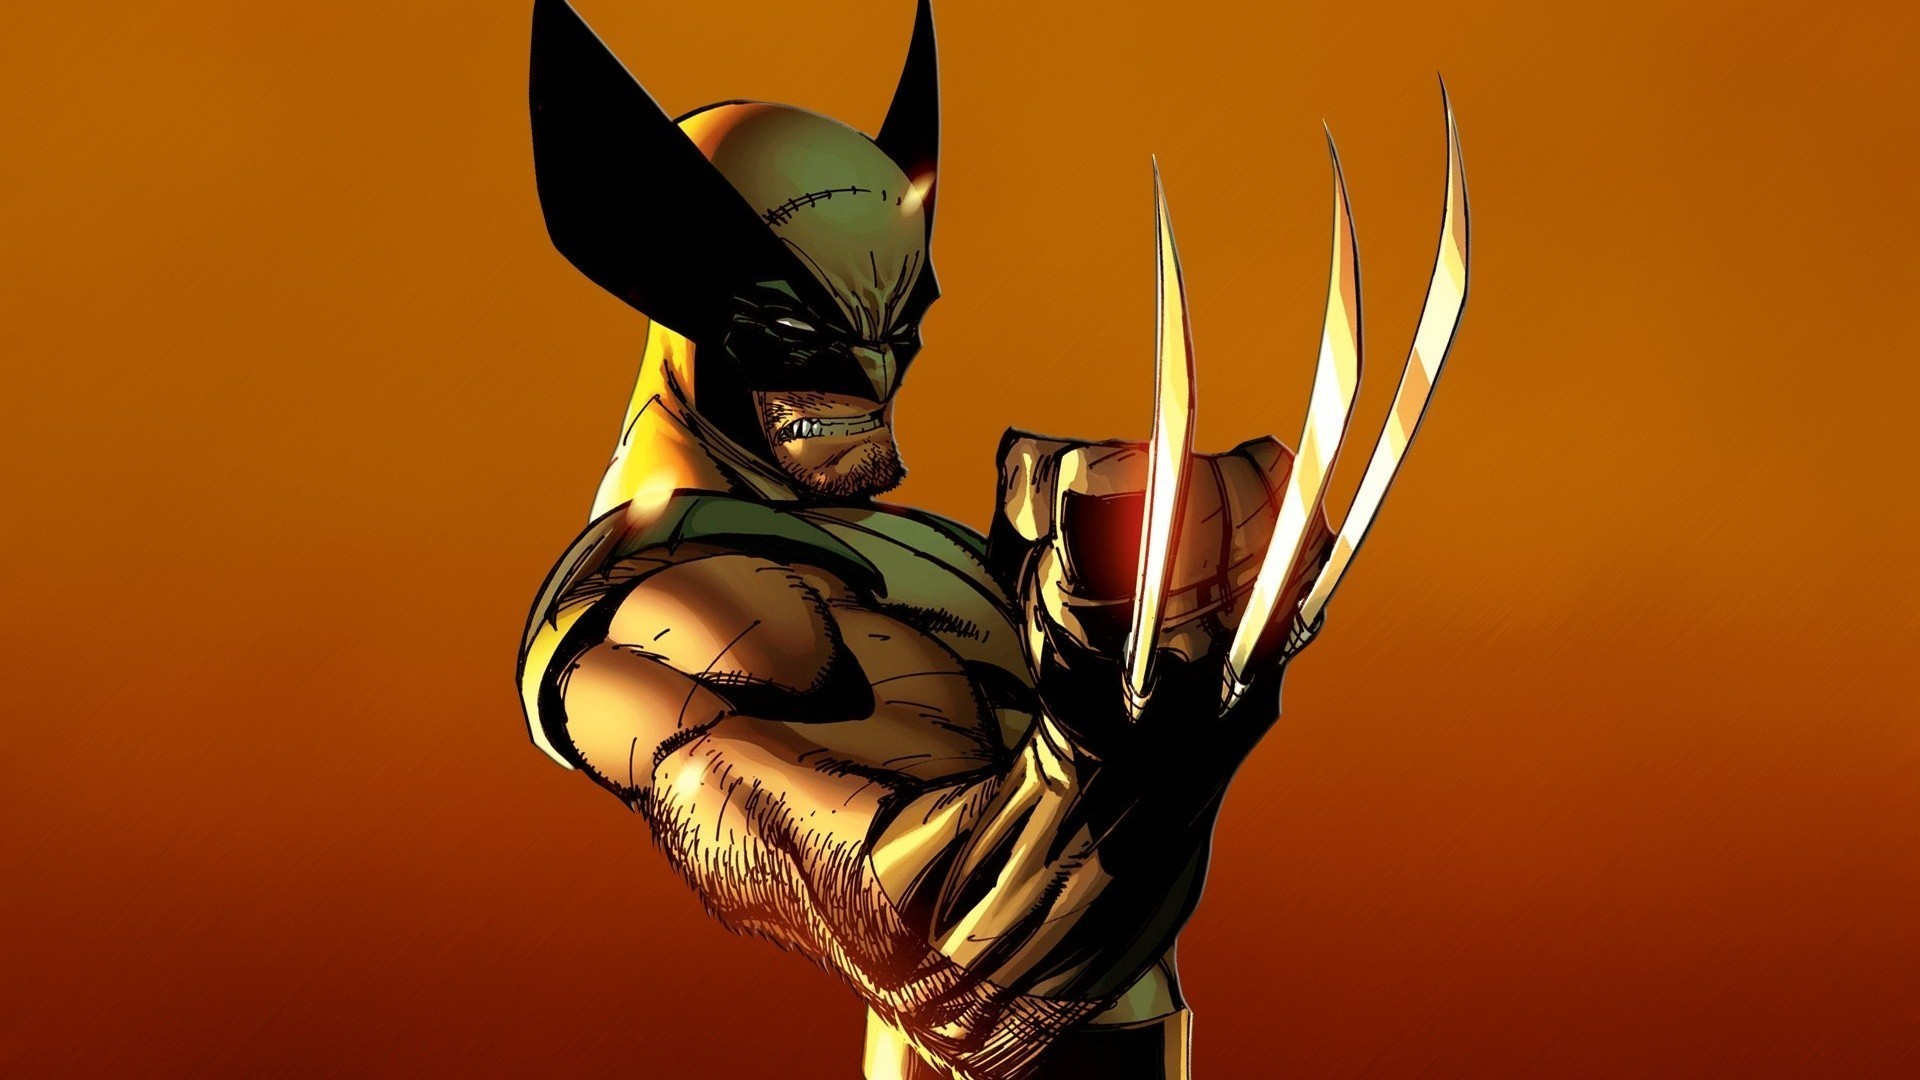 Res: 1920x1080, Marvel comics wolverine wallpaper